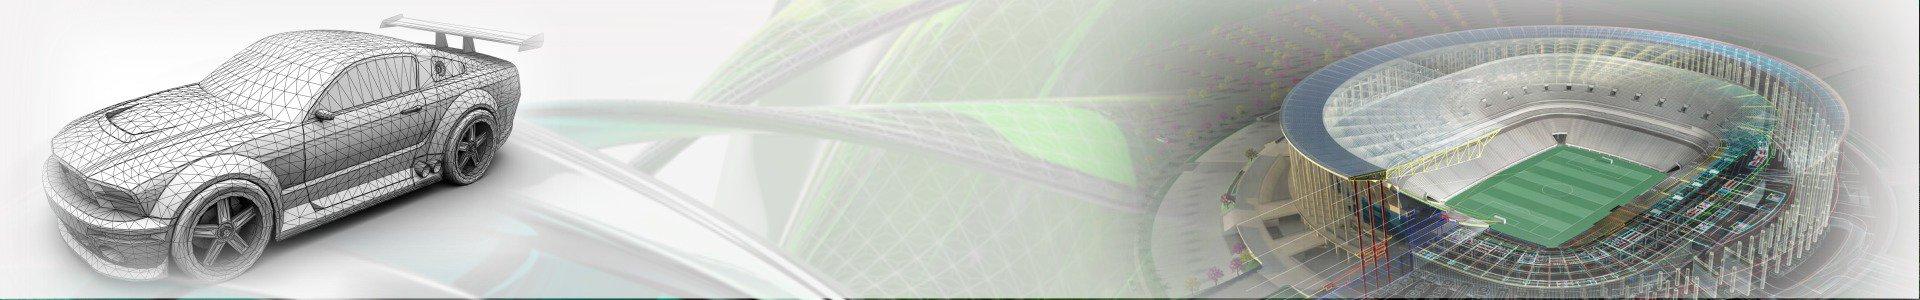 sopan-banner.jpg